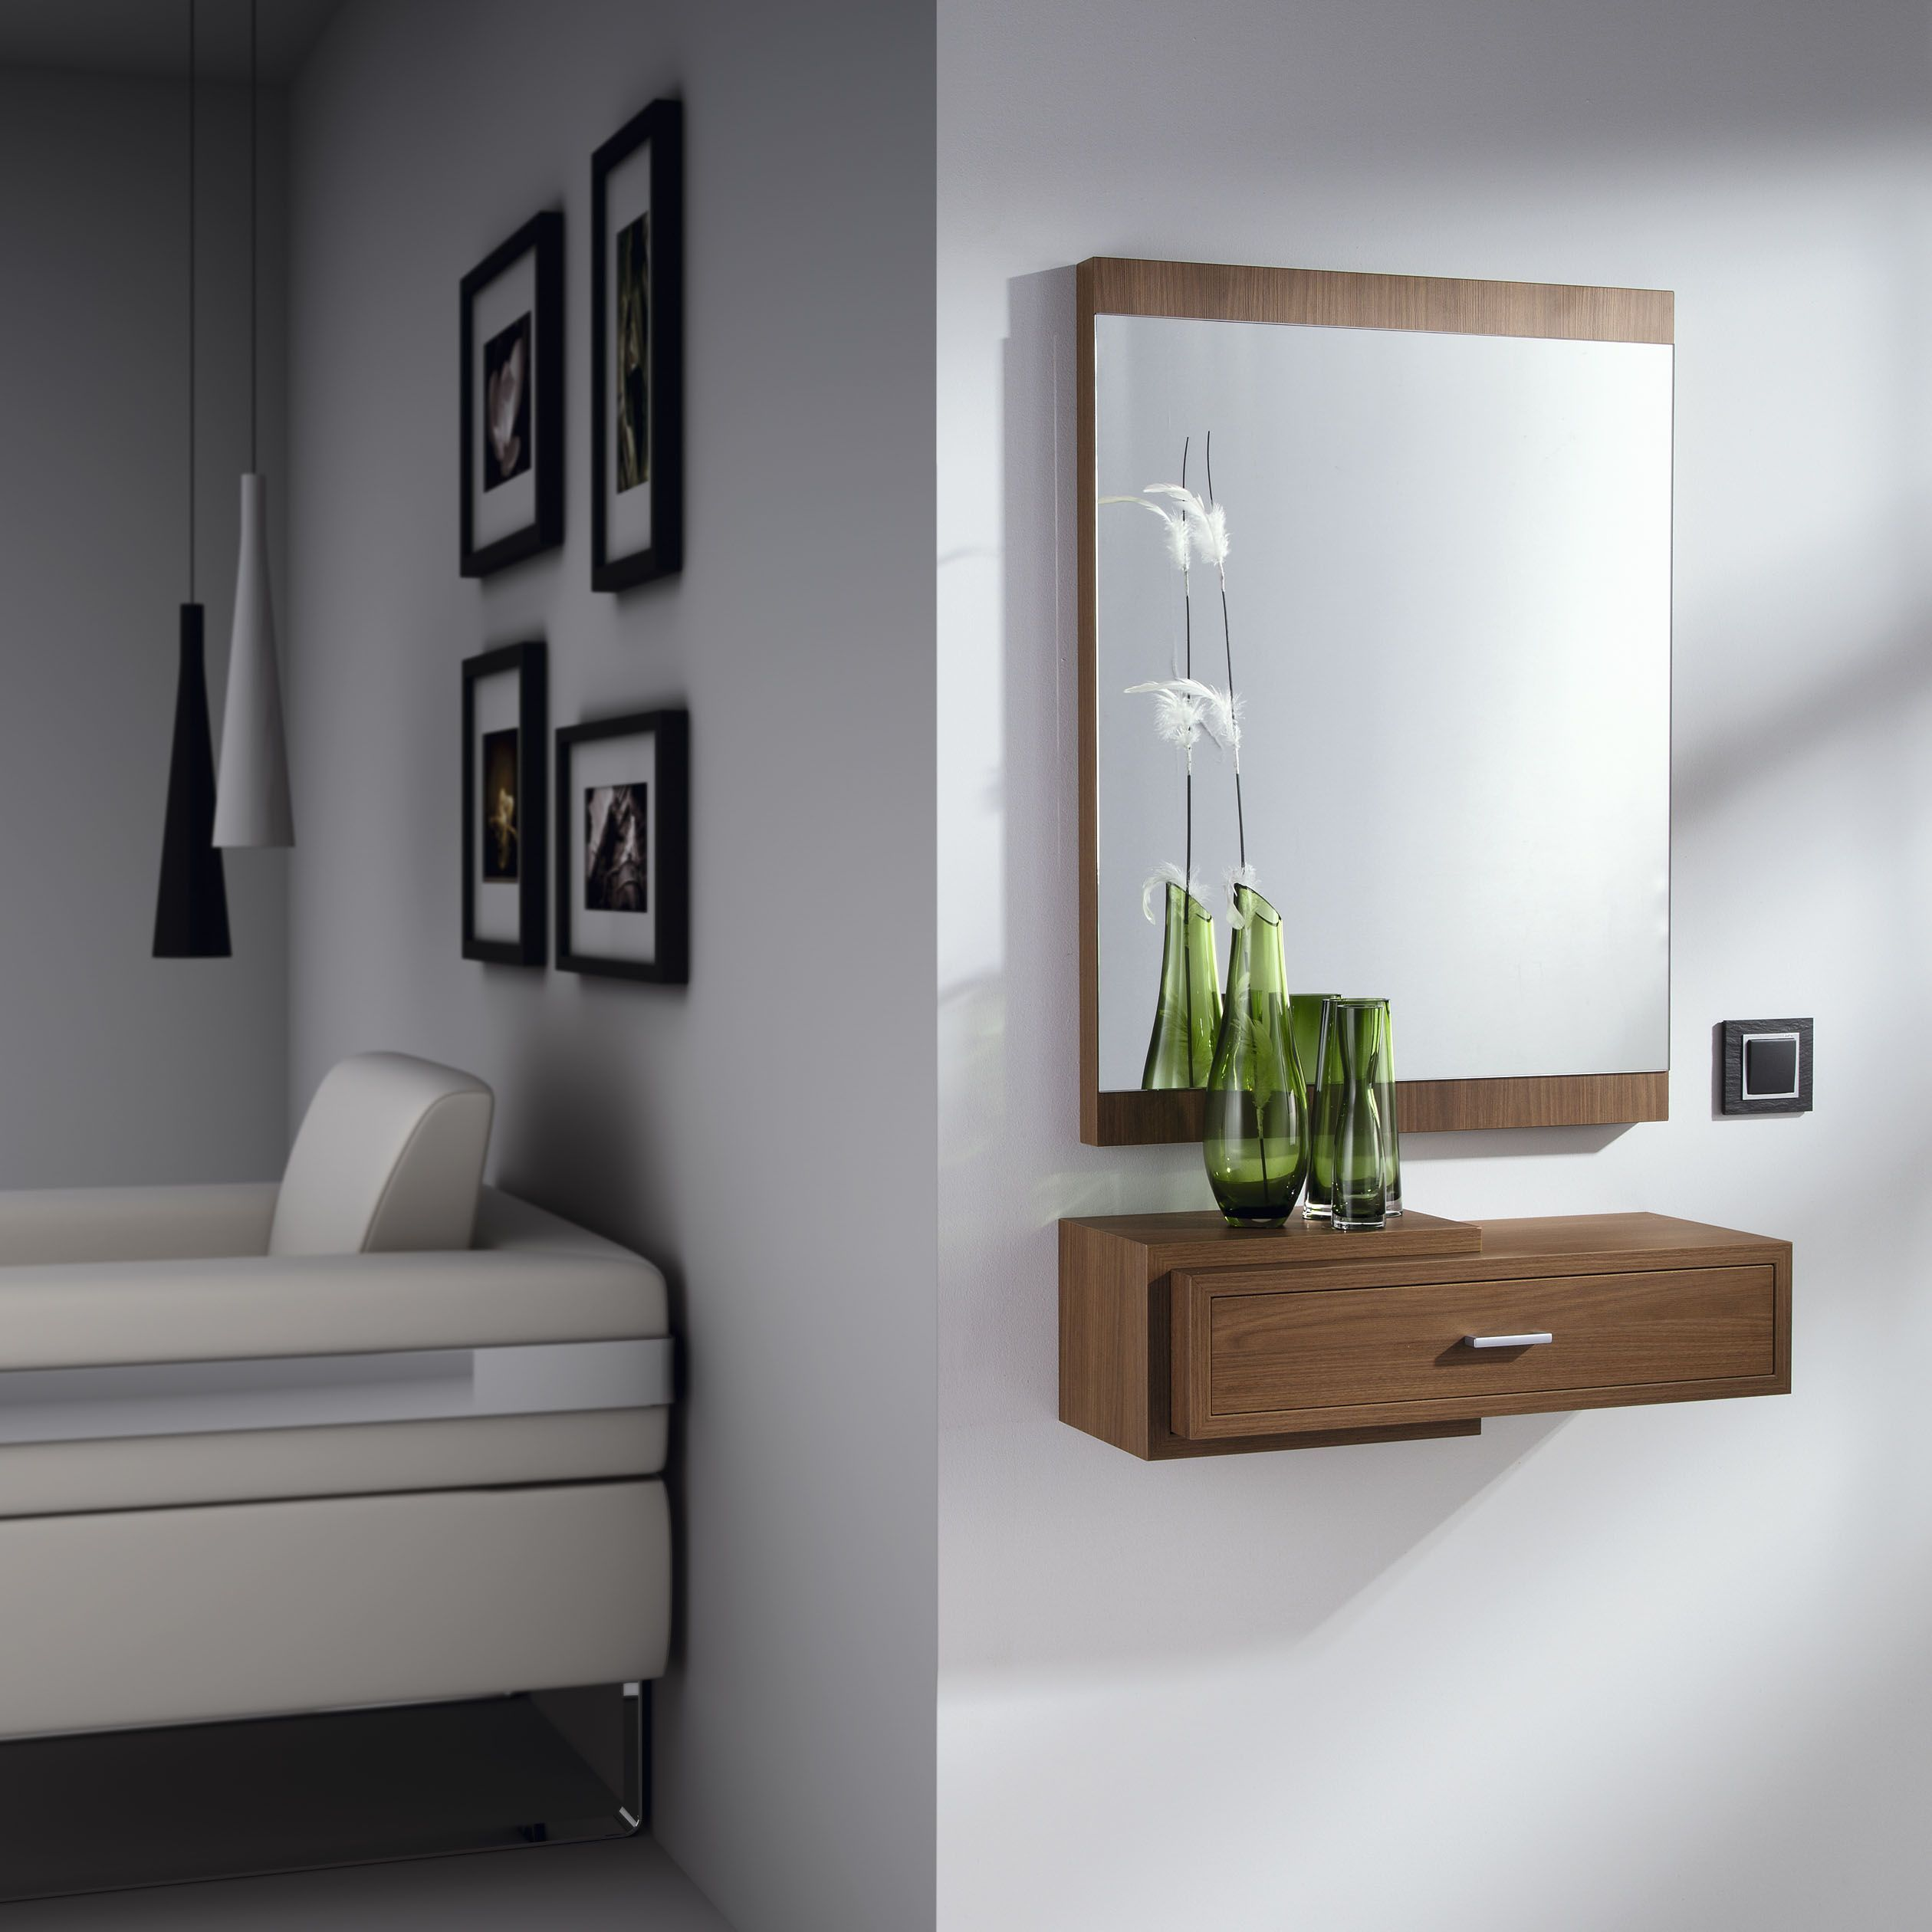 Recibidores Modernos Cheap Recibidores Modernos With Recibidores  # Muebles Gimenez Recibidores